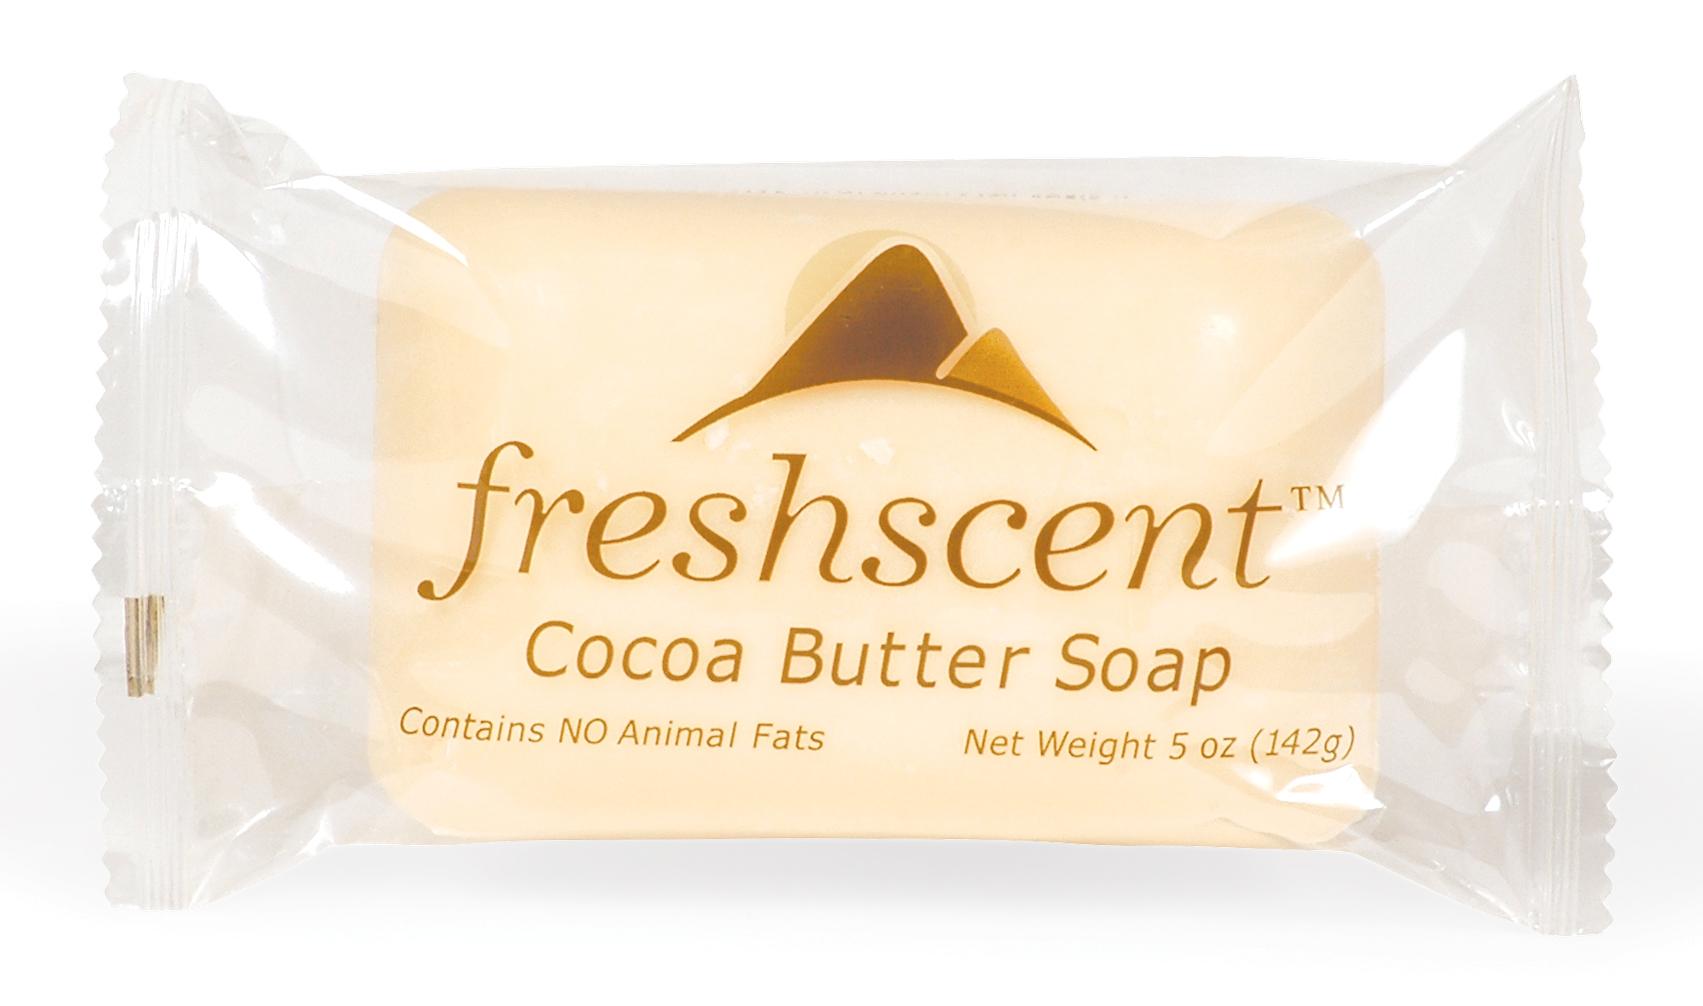 Freshscent 5oz Cocoa Butter SOAP